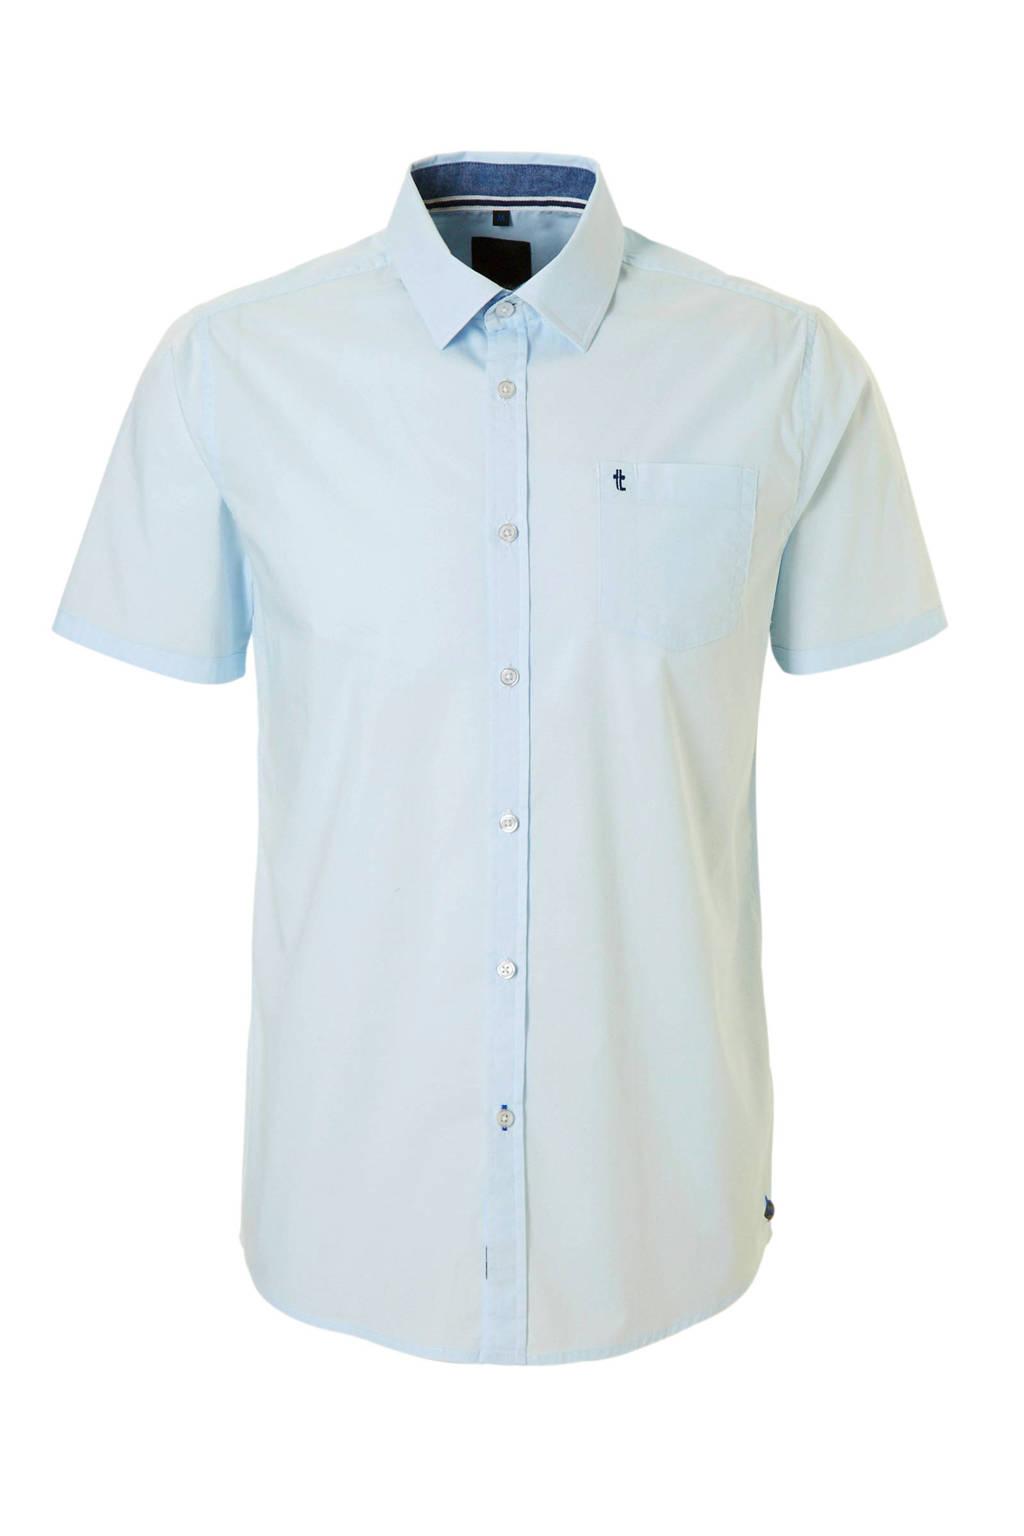 Twinlife overhemd korte mouw, Lichtblauw